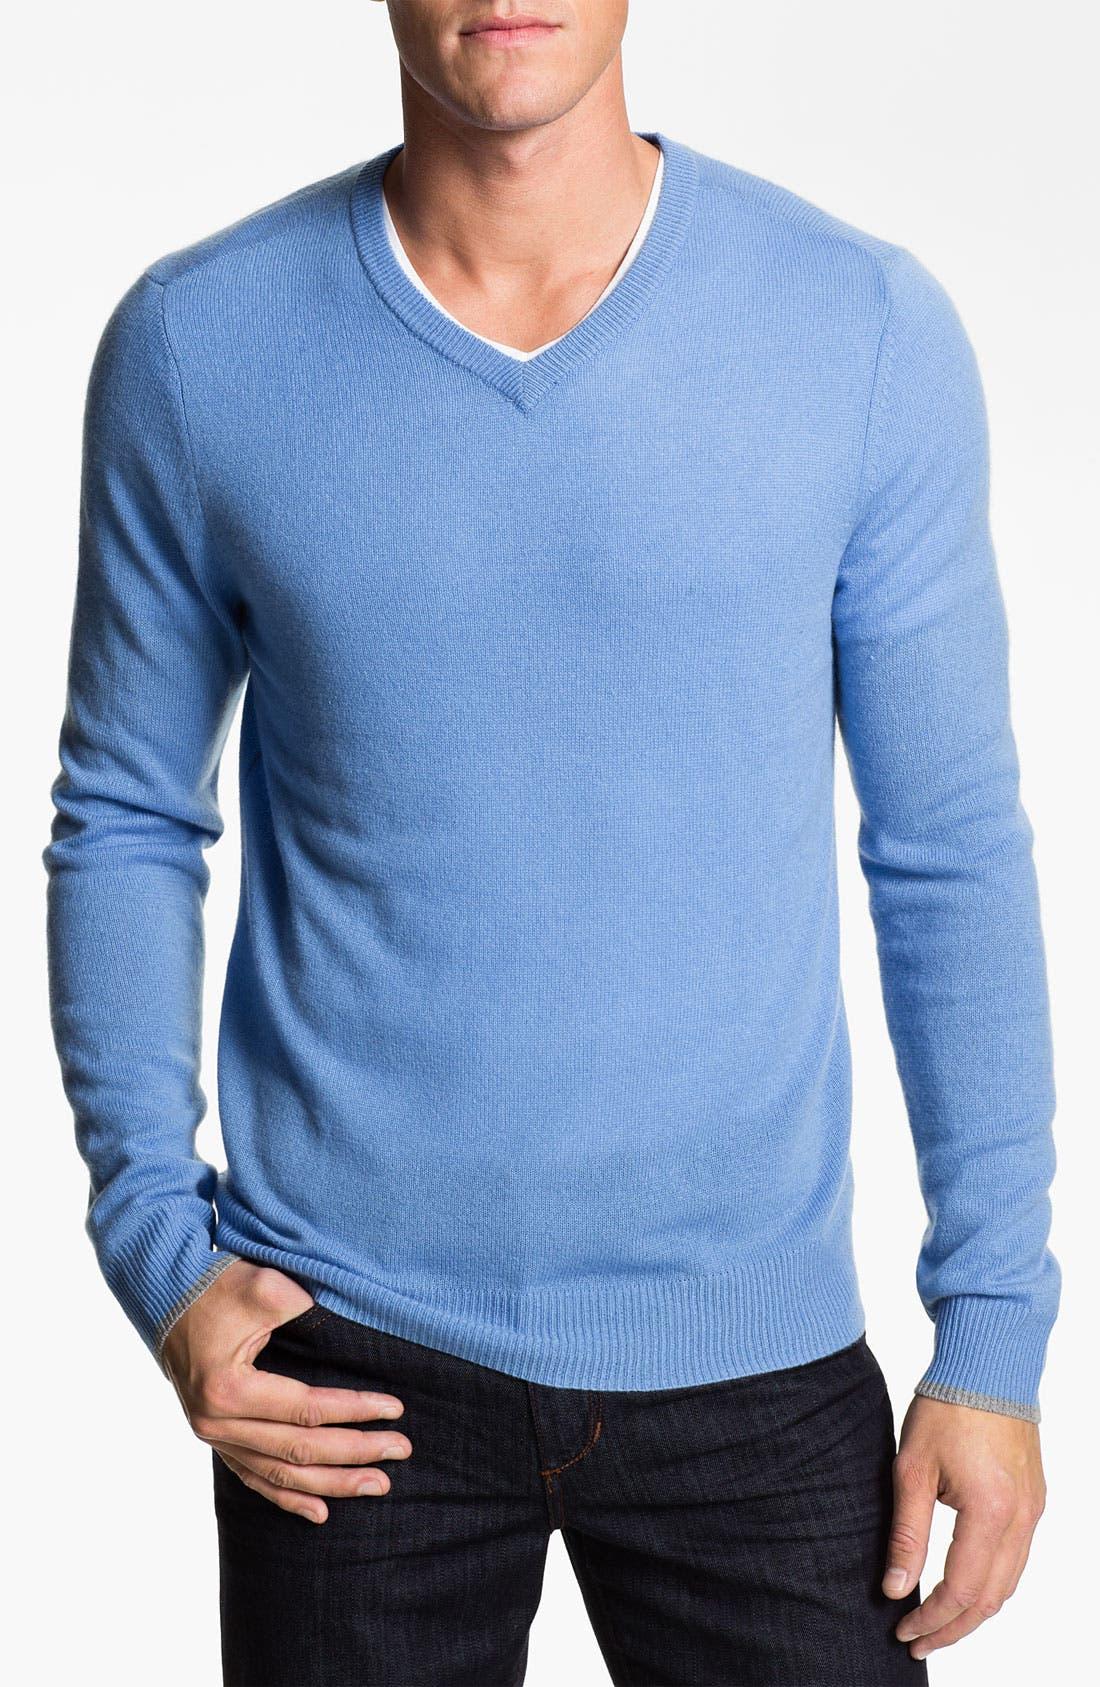 Alternate Image 1 Selected - 1901 Trim Fit V-Neck Cashmere Sweater